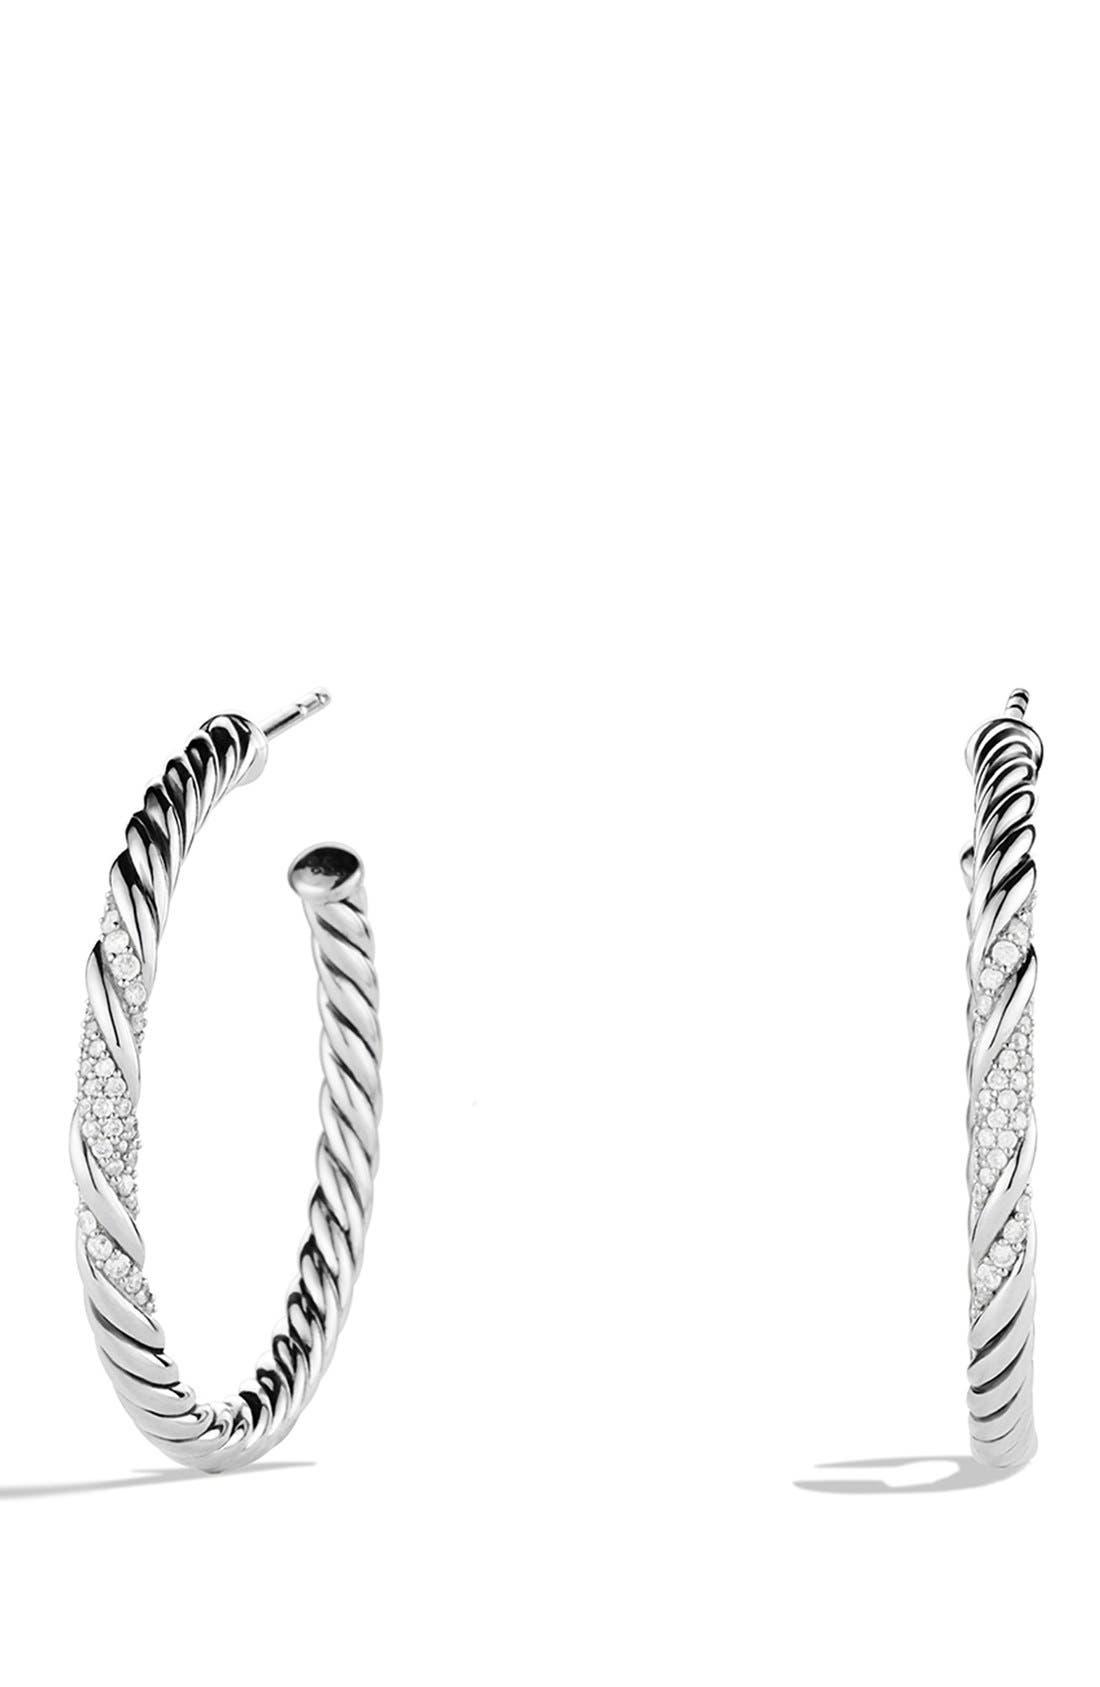 Alternate Image 1 Selected - David Yurman 'Willow' Medium Hoop Earrings with Diamonds